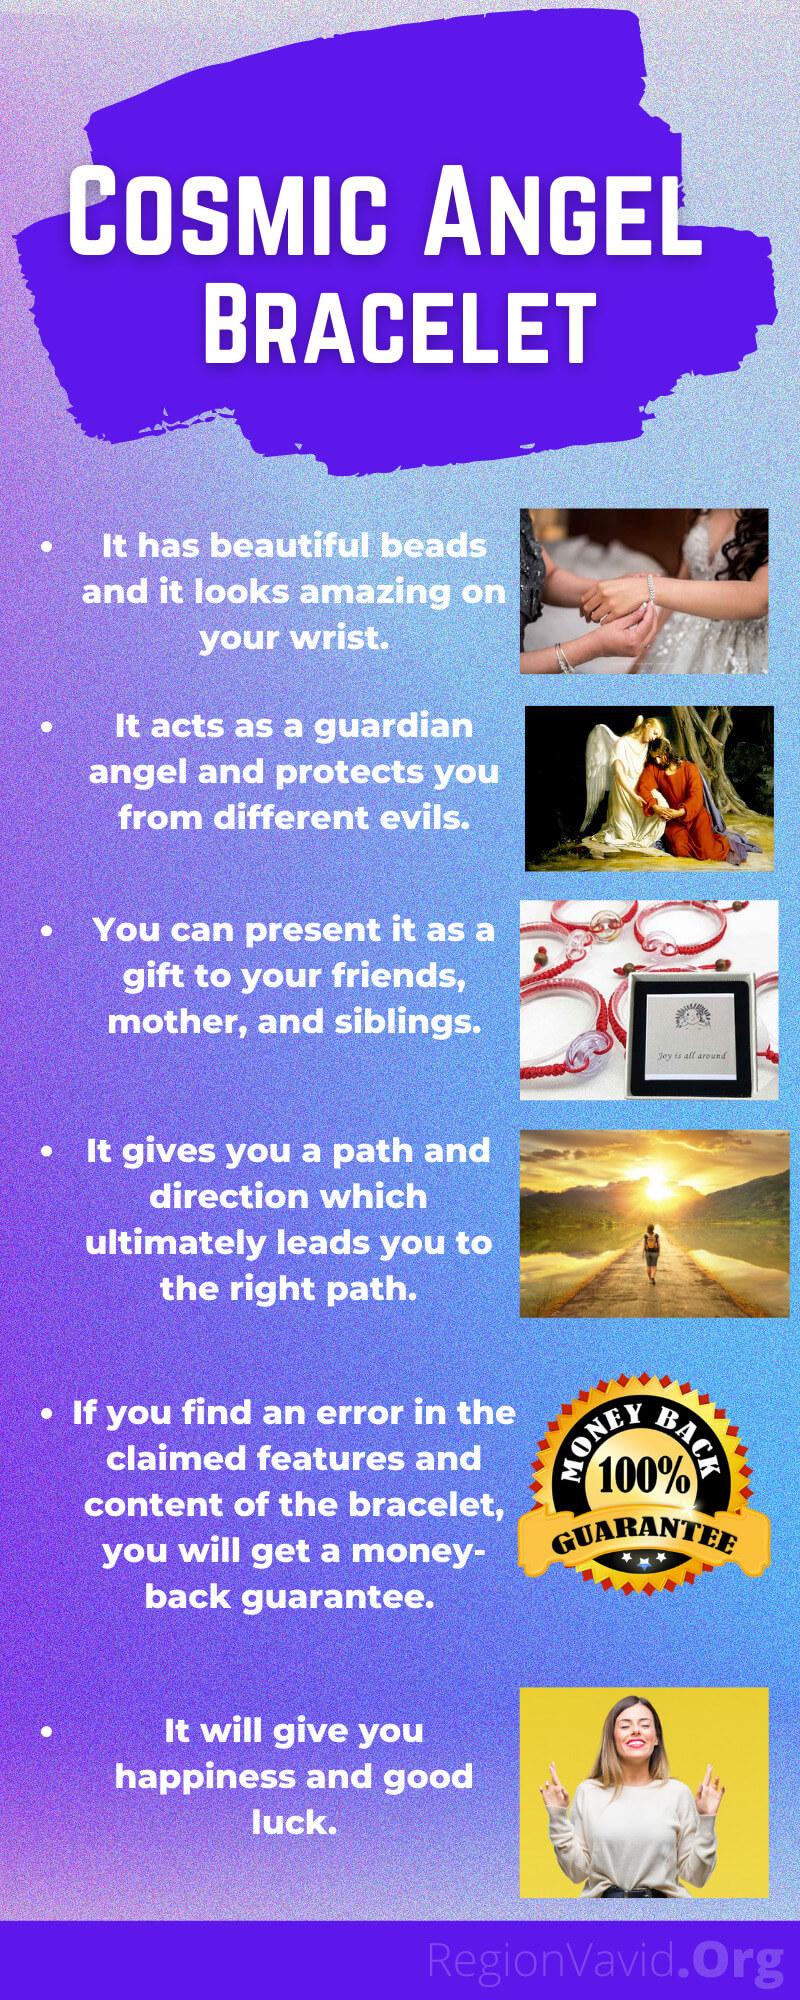 Cosmic Angel Bracelet What You Get